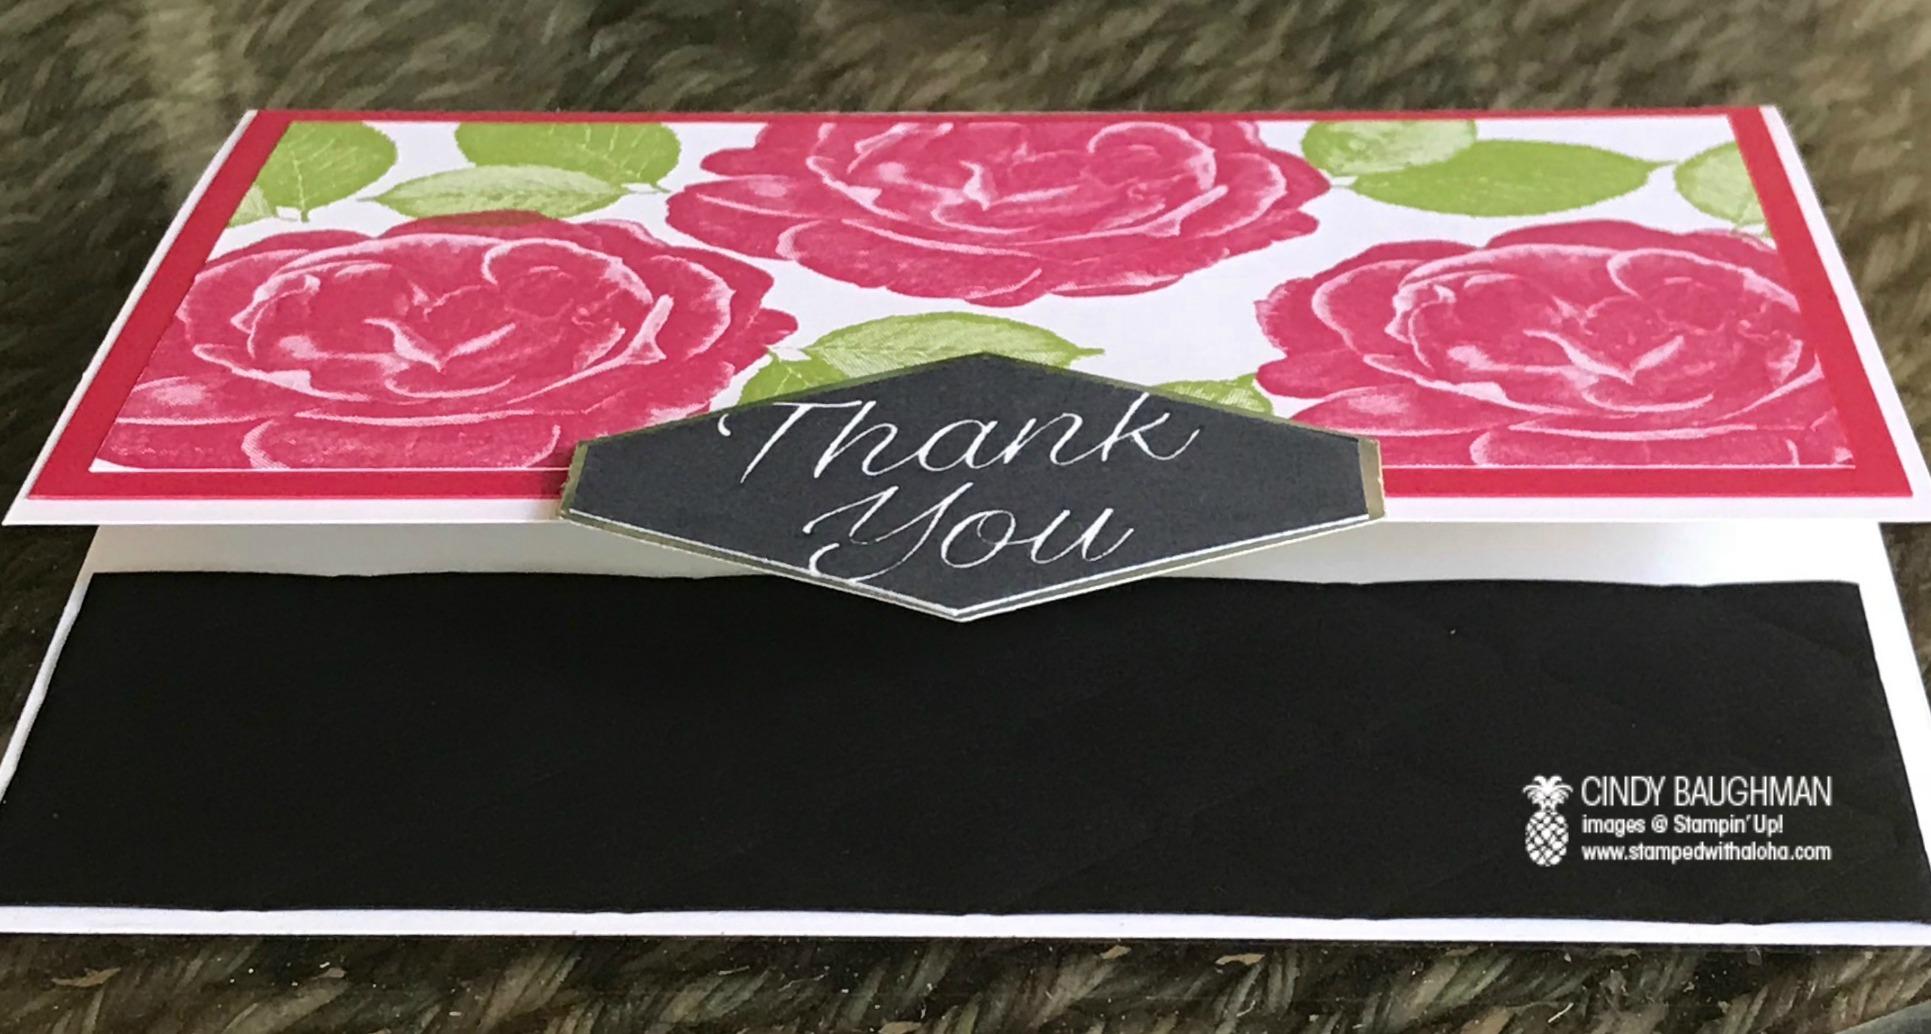 Healing Hugs Cropped Card - www.stampedwithaloha.com